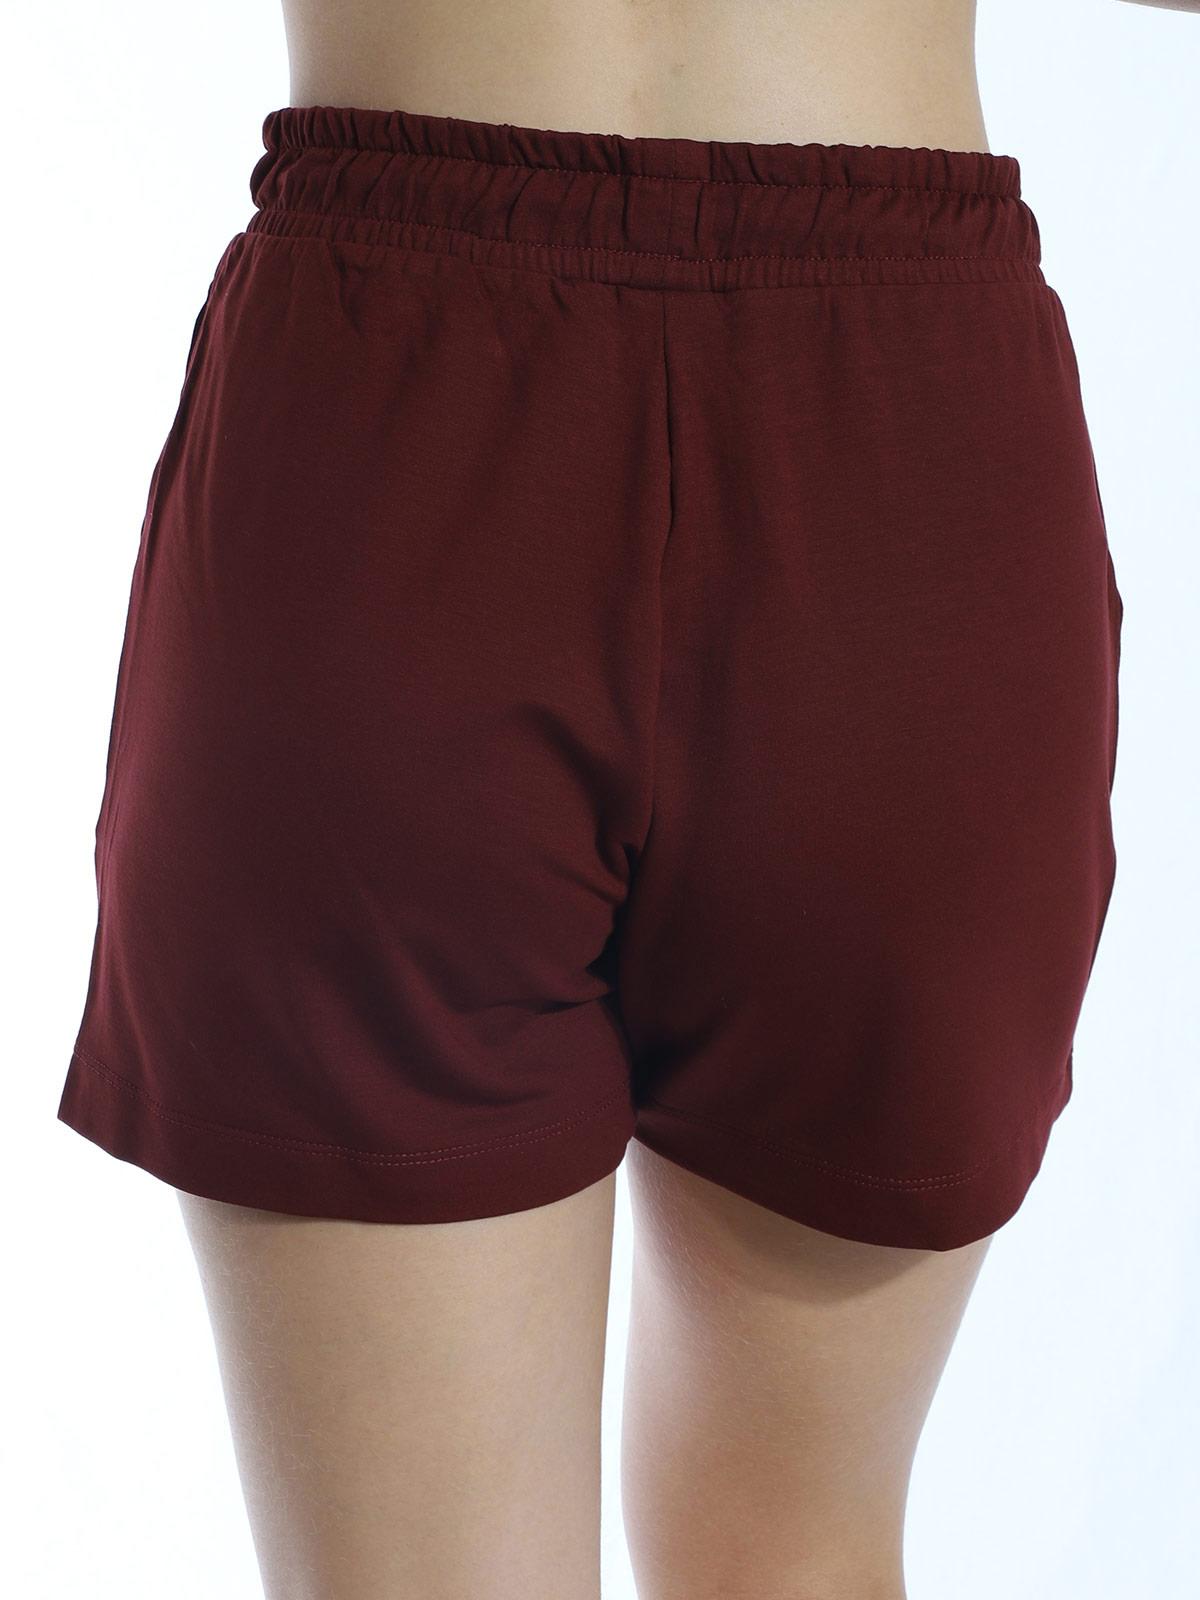 Shorts Feminino Moletom Visco Confortável Soltinho Bordo